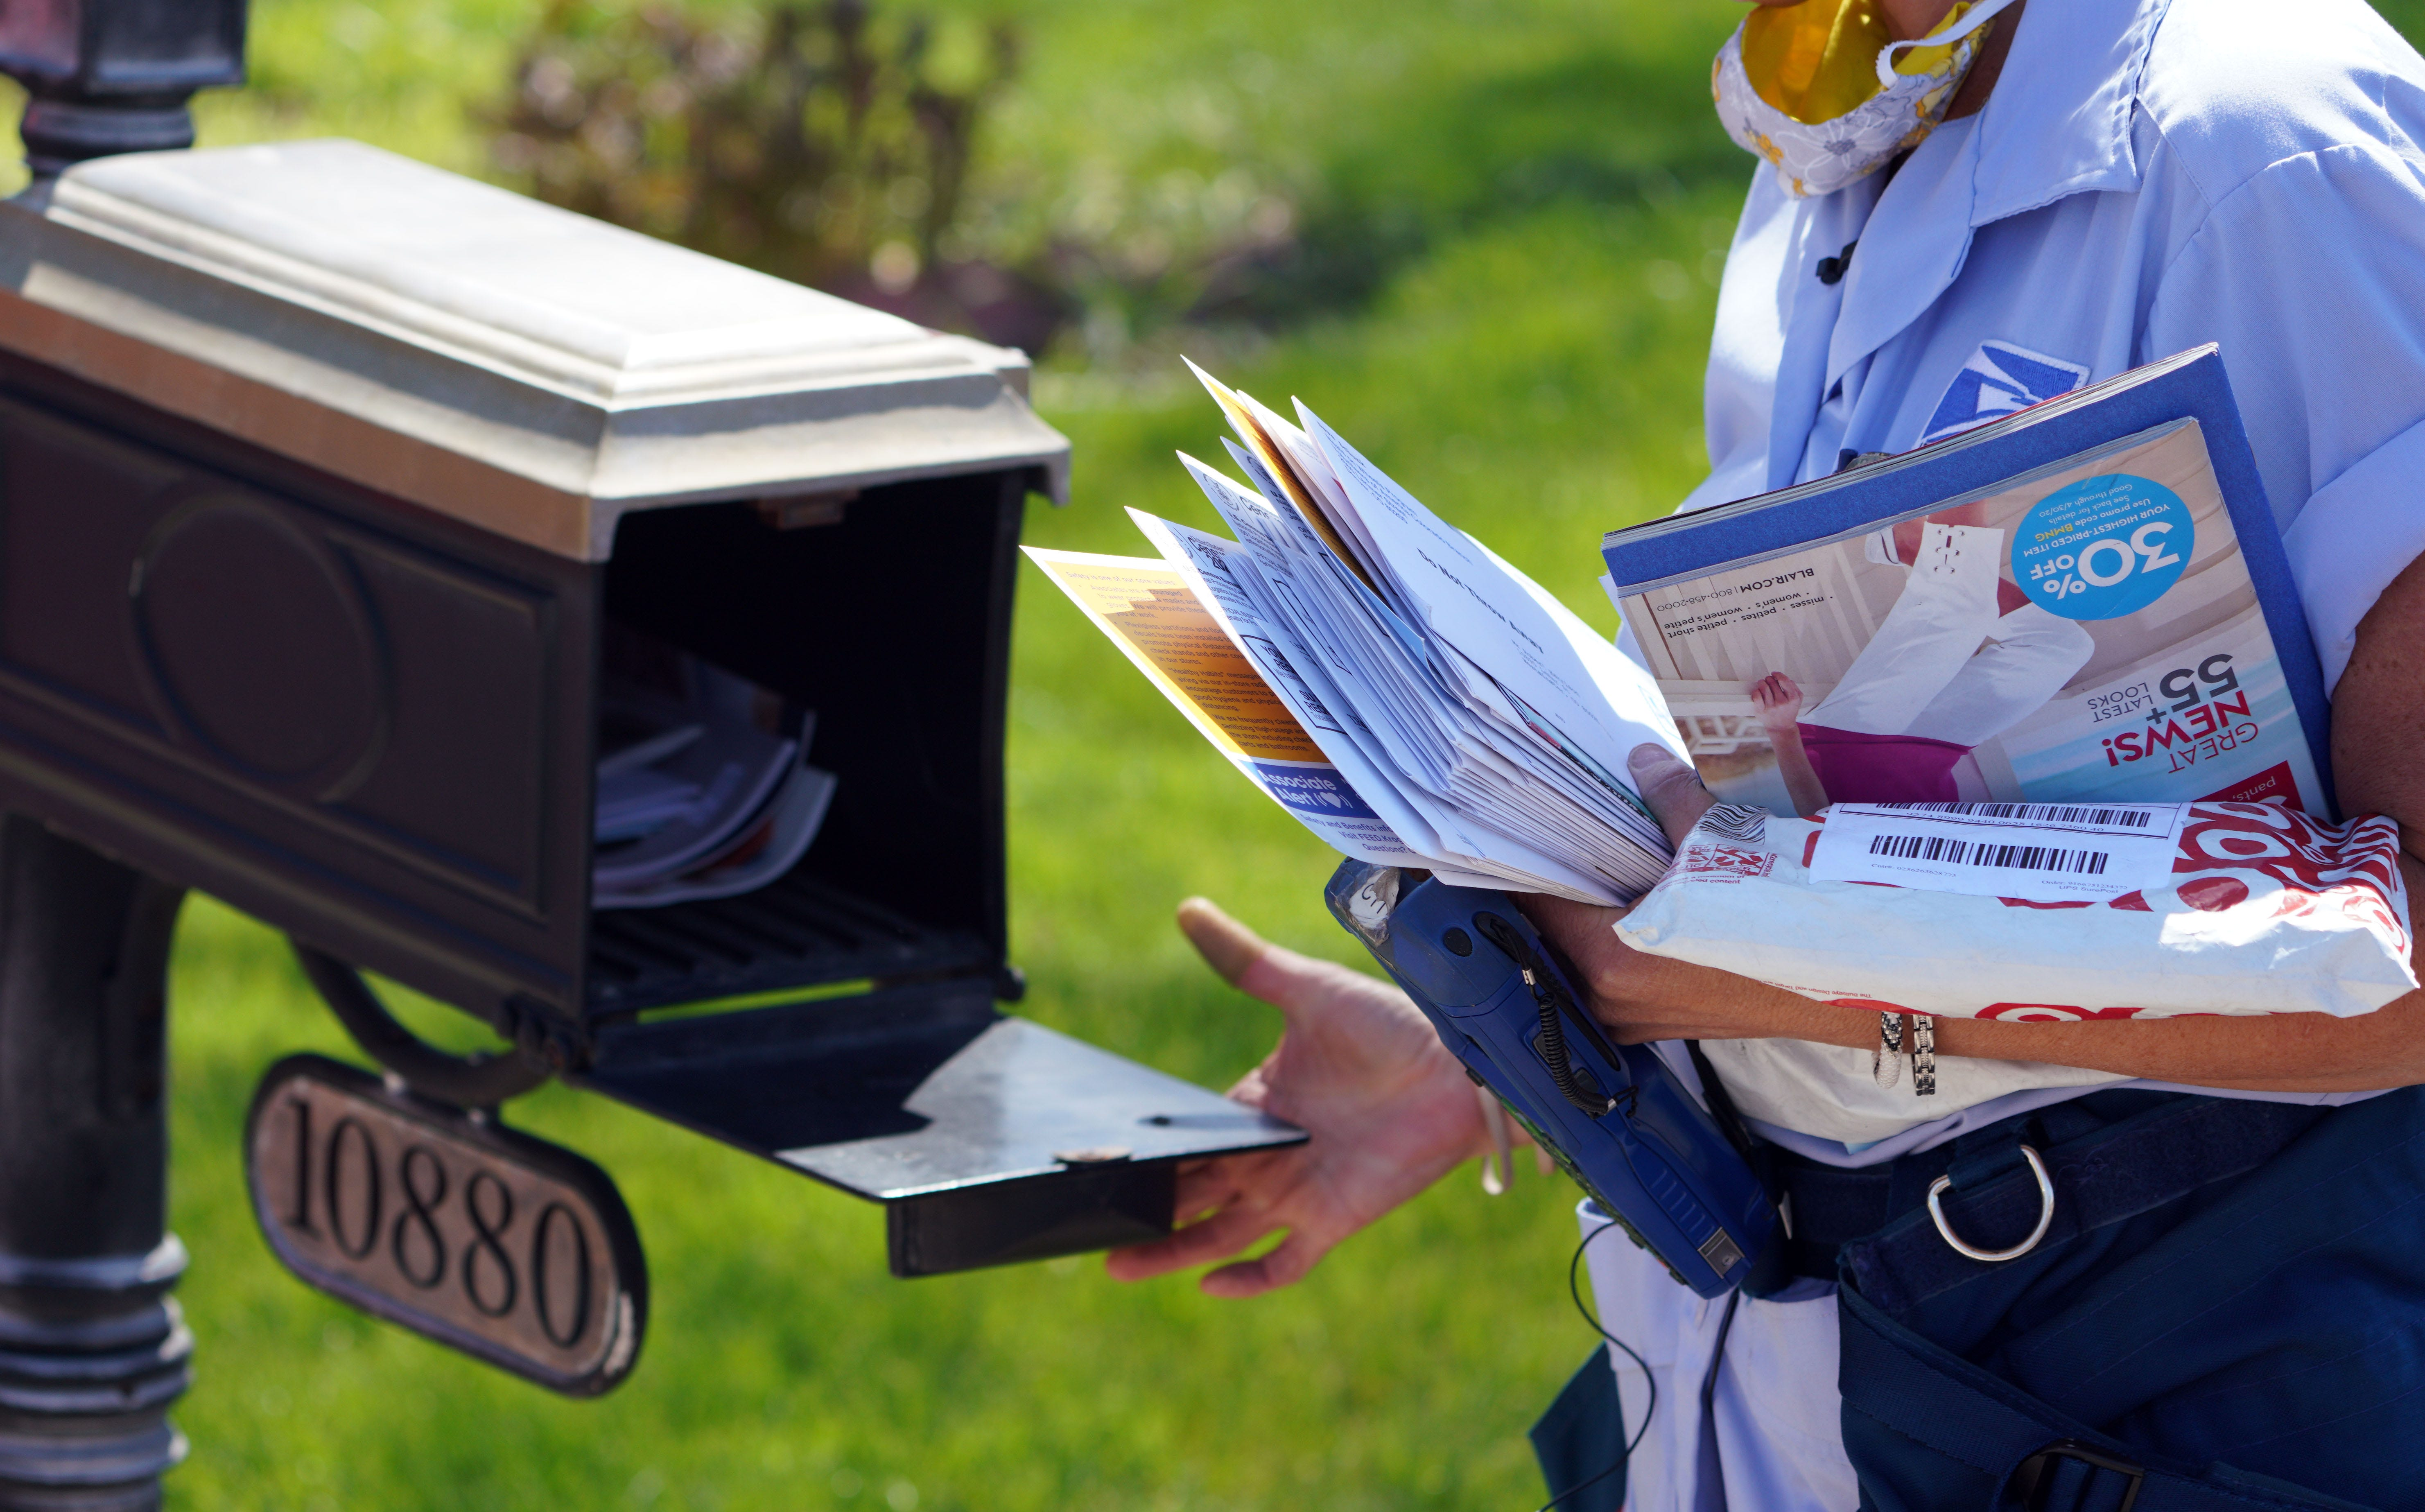 Ups Losing Money Christmas 2020 Coronavirus deliveries: Mail carriers, FedEx, UPS workers busier